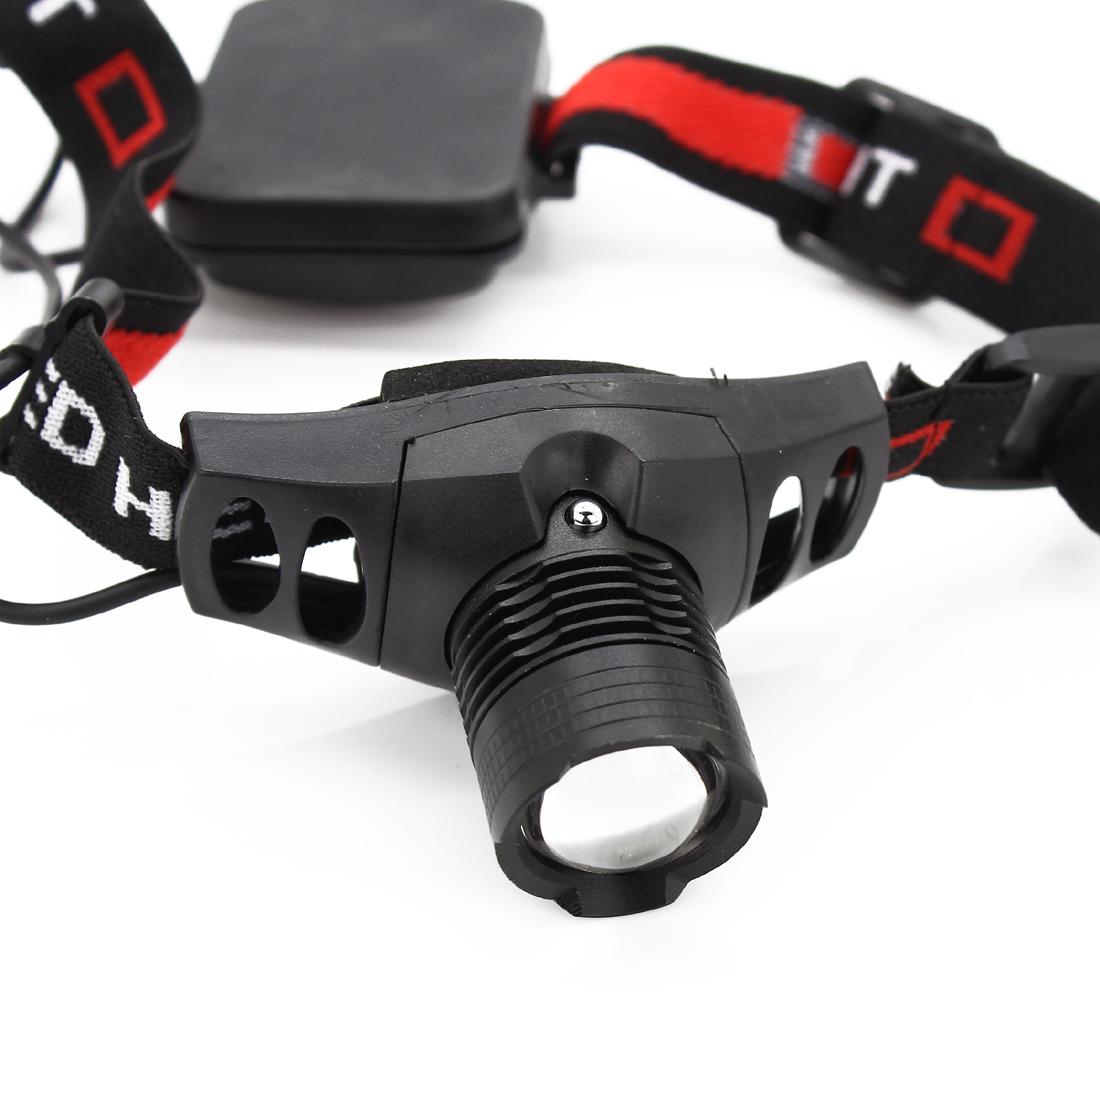 Гаджет  CREE Q5 LED 5W Zoomable Headlamp Torch Rechargeable Flashlight led Headlight Top Quality Head Light Wholesale None Свет и освещение